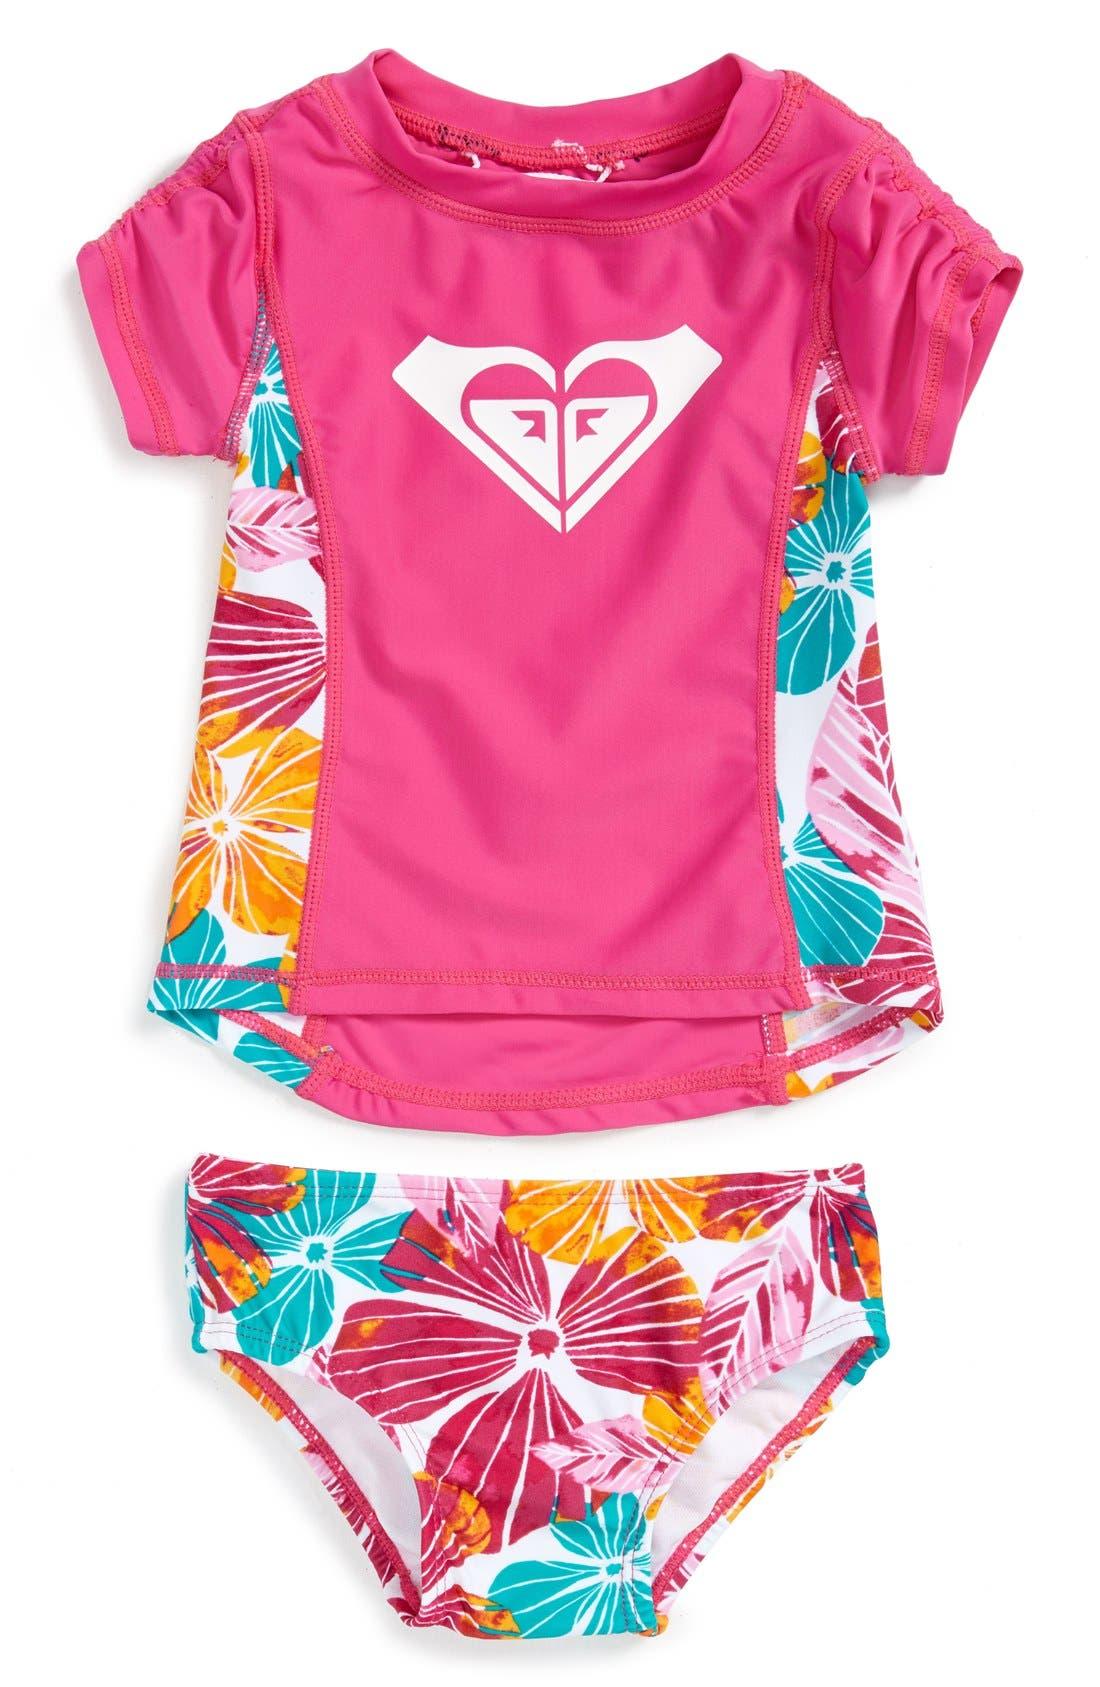 Two-Piece Rashguard Swimsuit,                             Main thumbnail 1, color,                             650